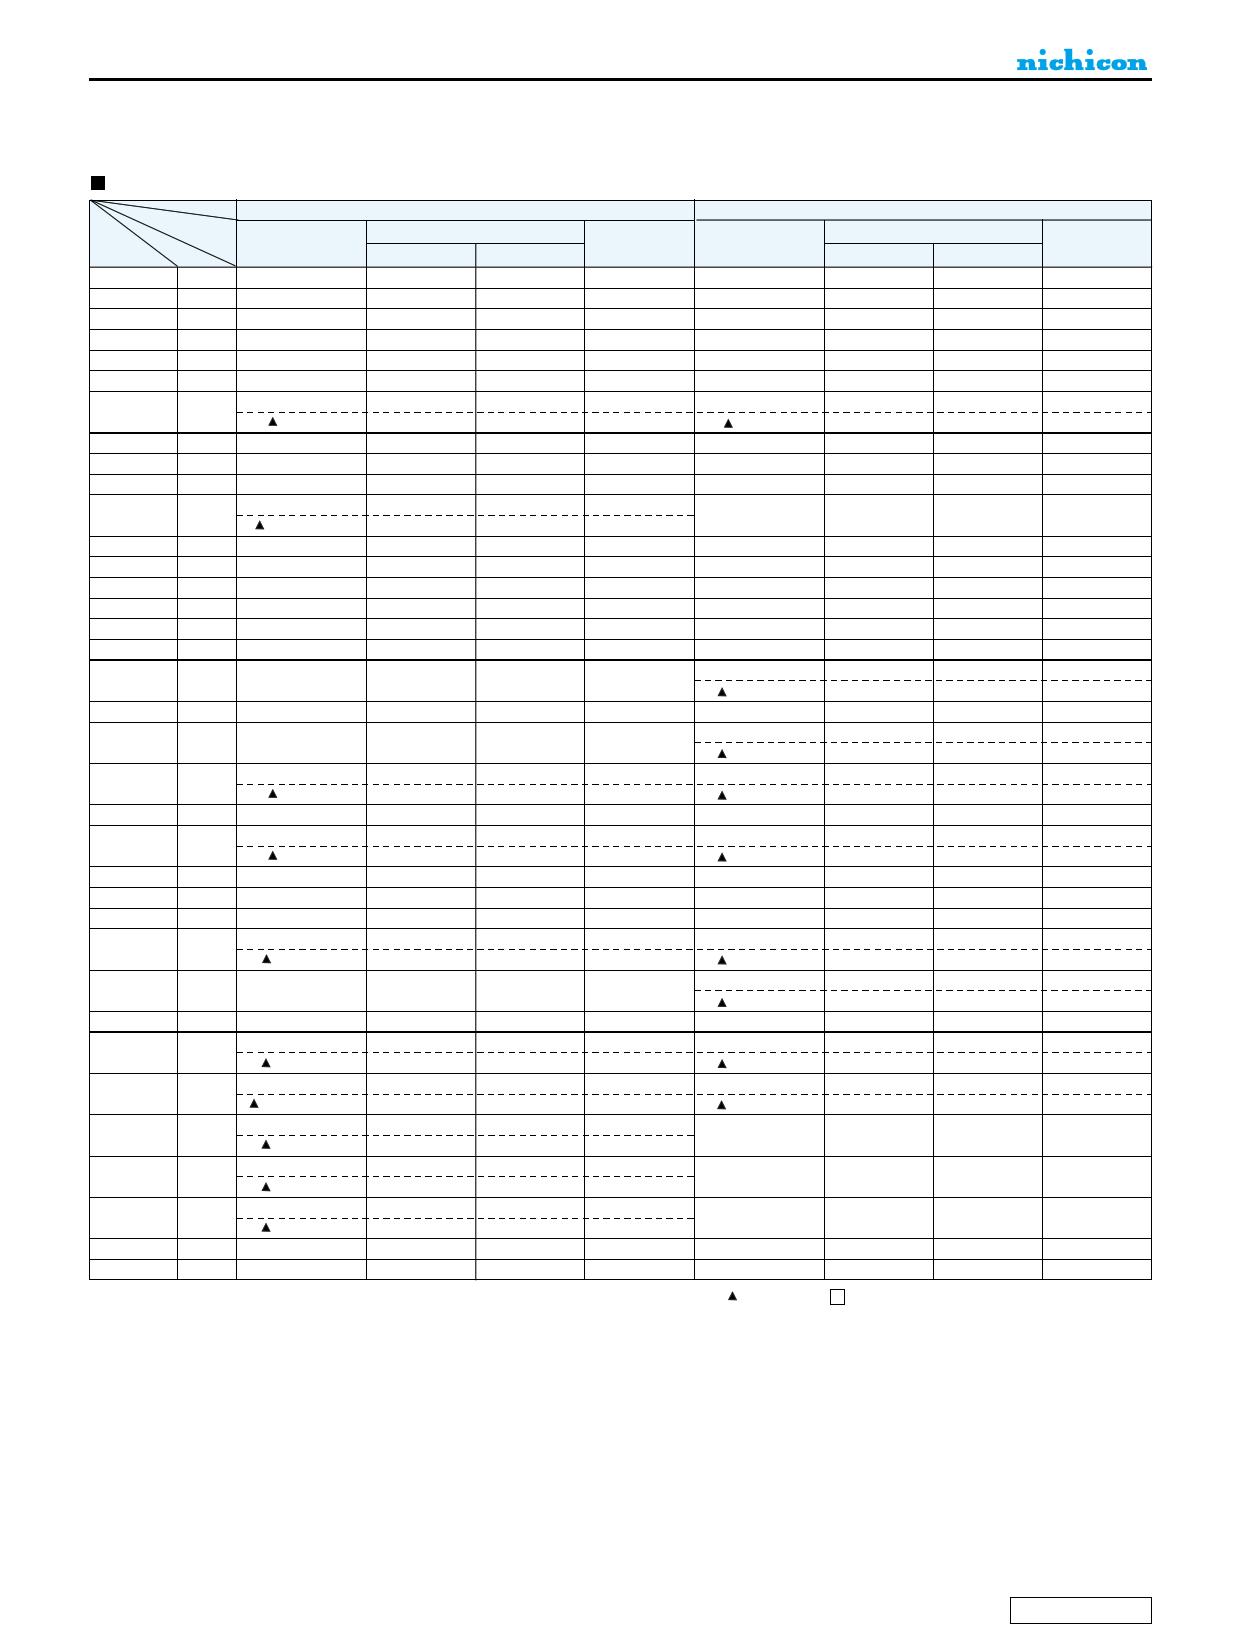 UPW1A821MPD pdf, 반도체, 판매, 대치품